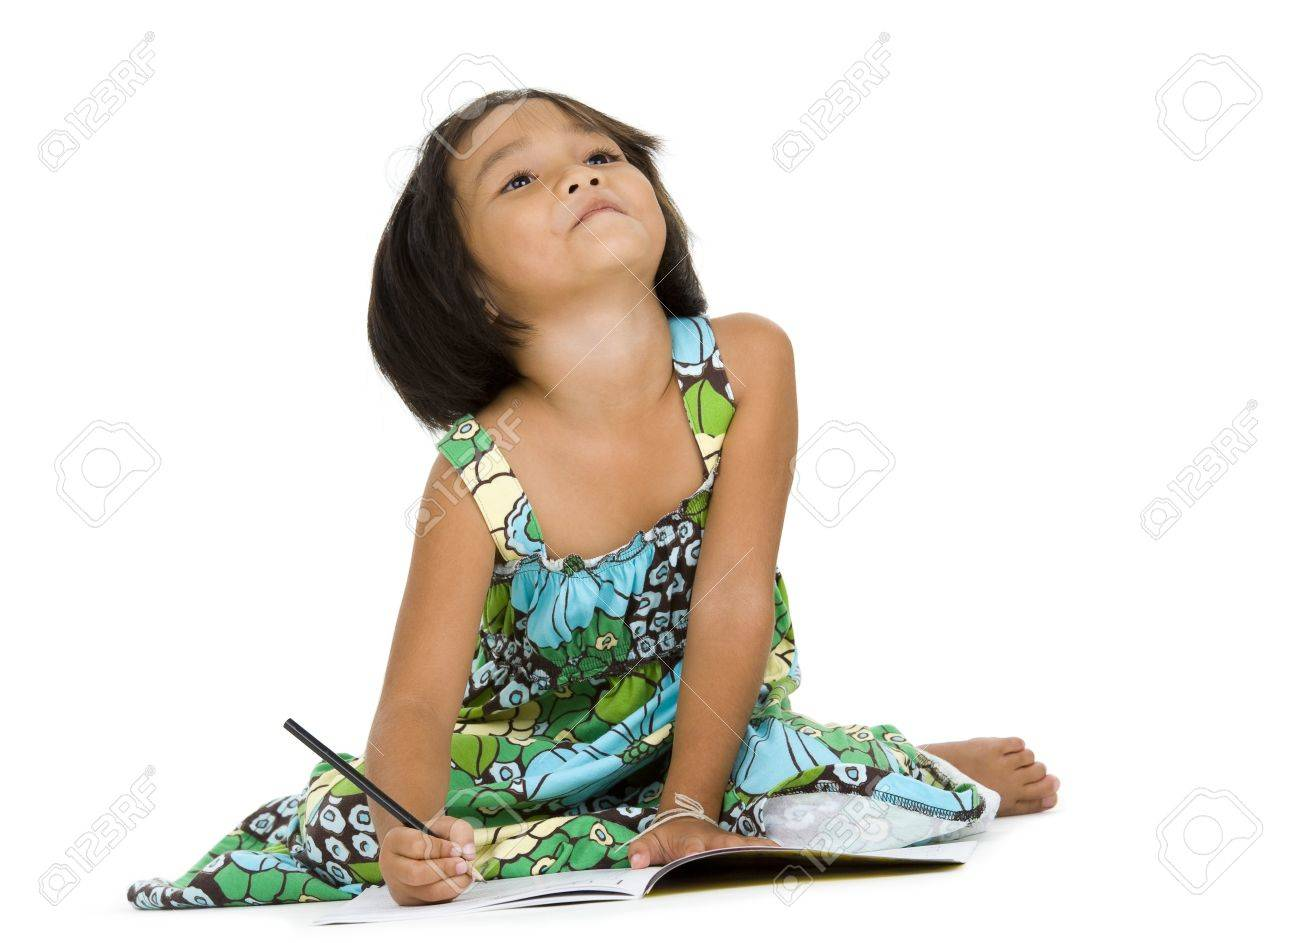 cute girl doing her homework, isolated on white background Stock Photo - 11800900